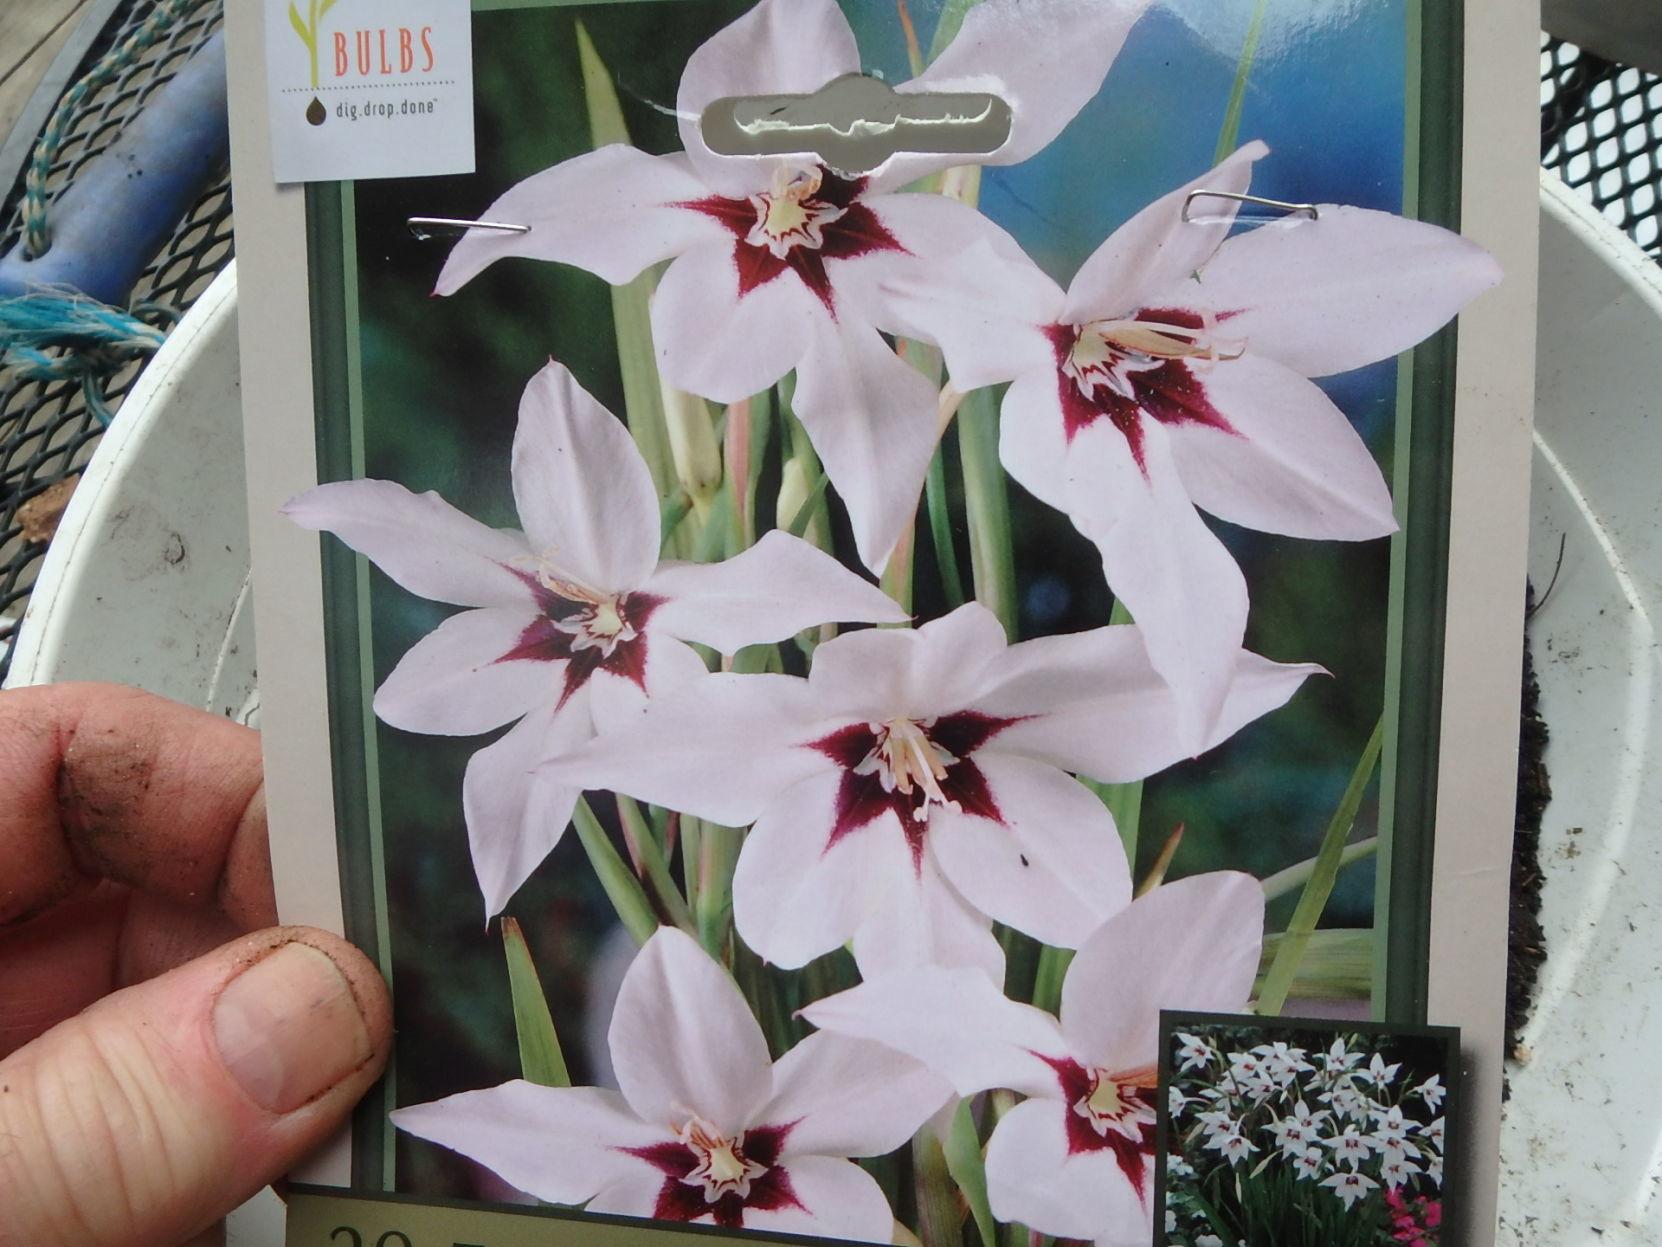 Bolly Bulbs® Mixed Calla Lily Rhizomes Spring//Summer flowers